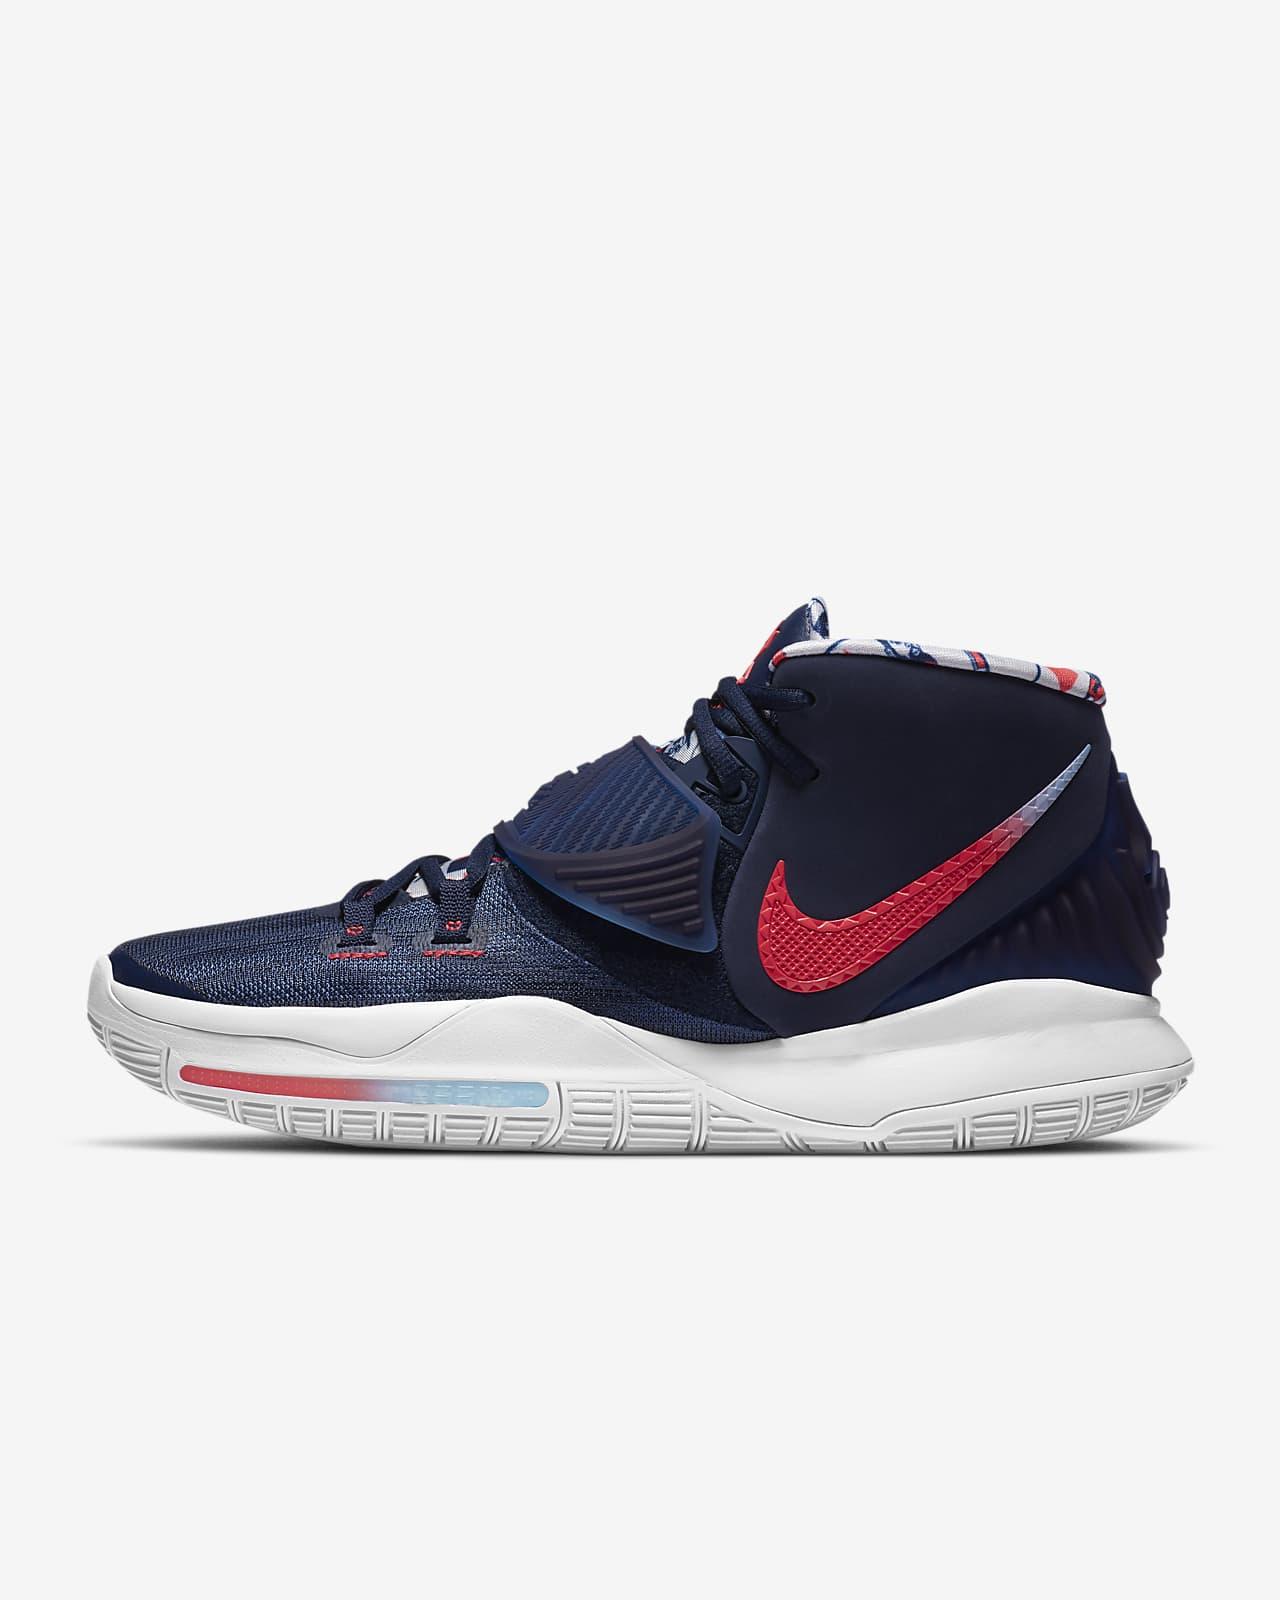 Kyrie 6 'Midnight Navy' Basketball Shoe